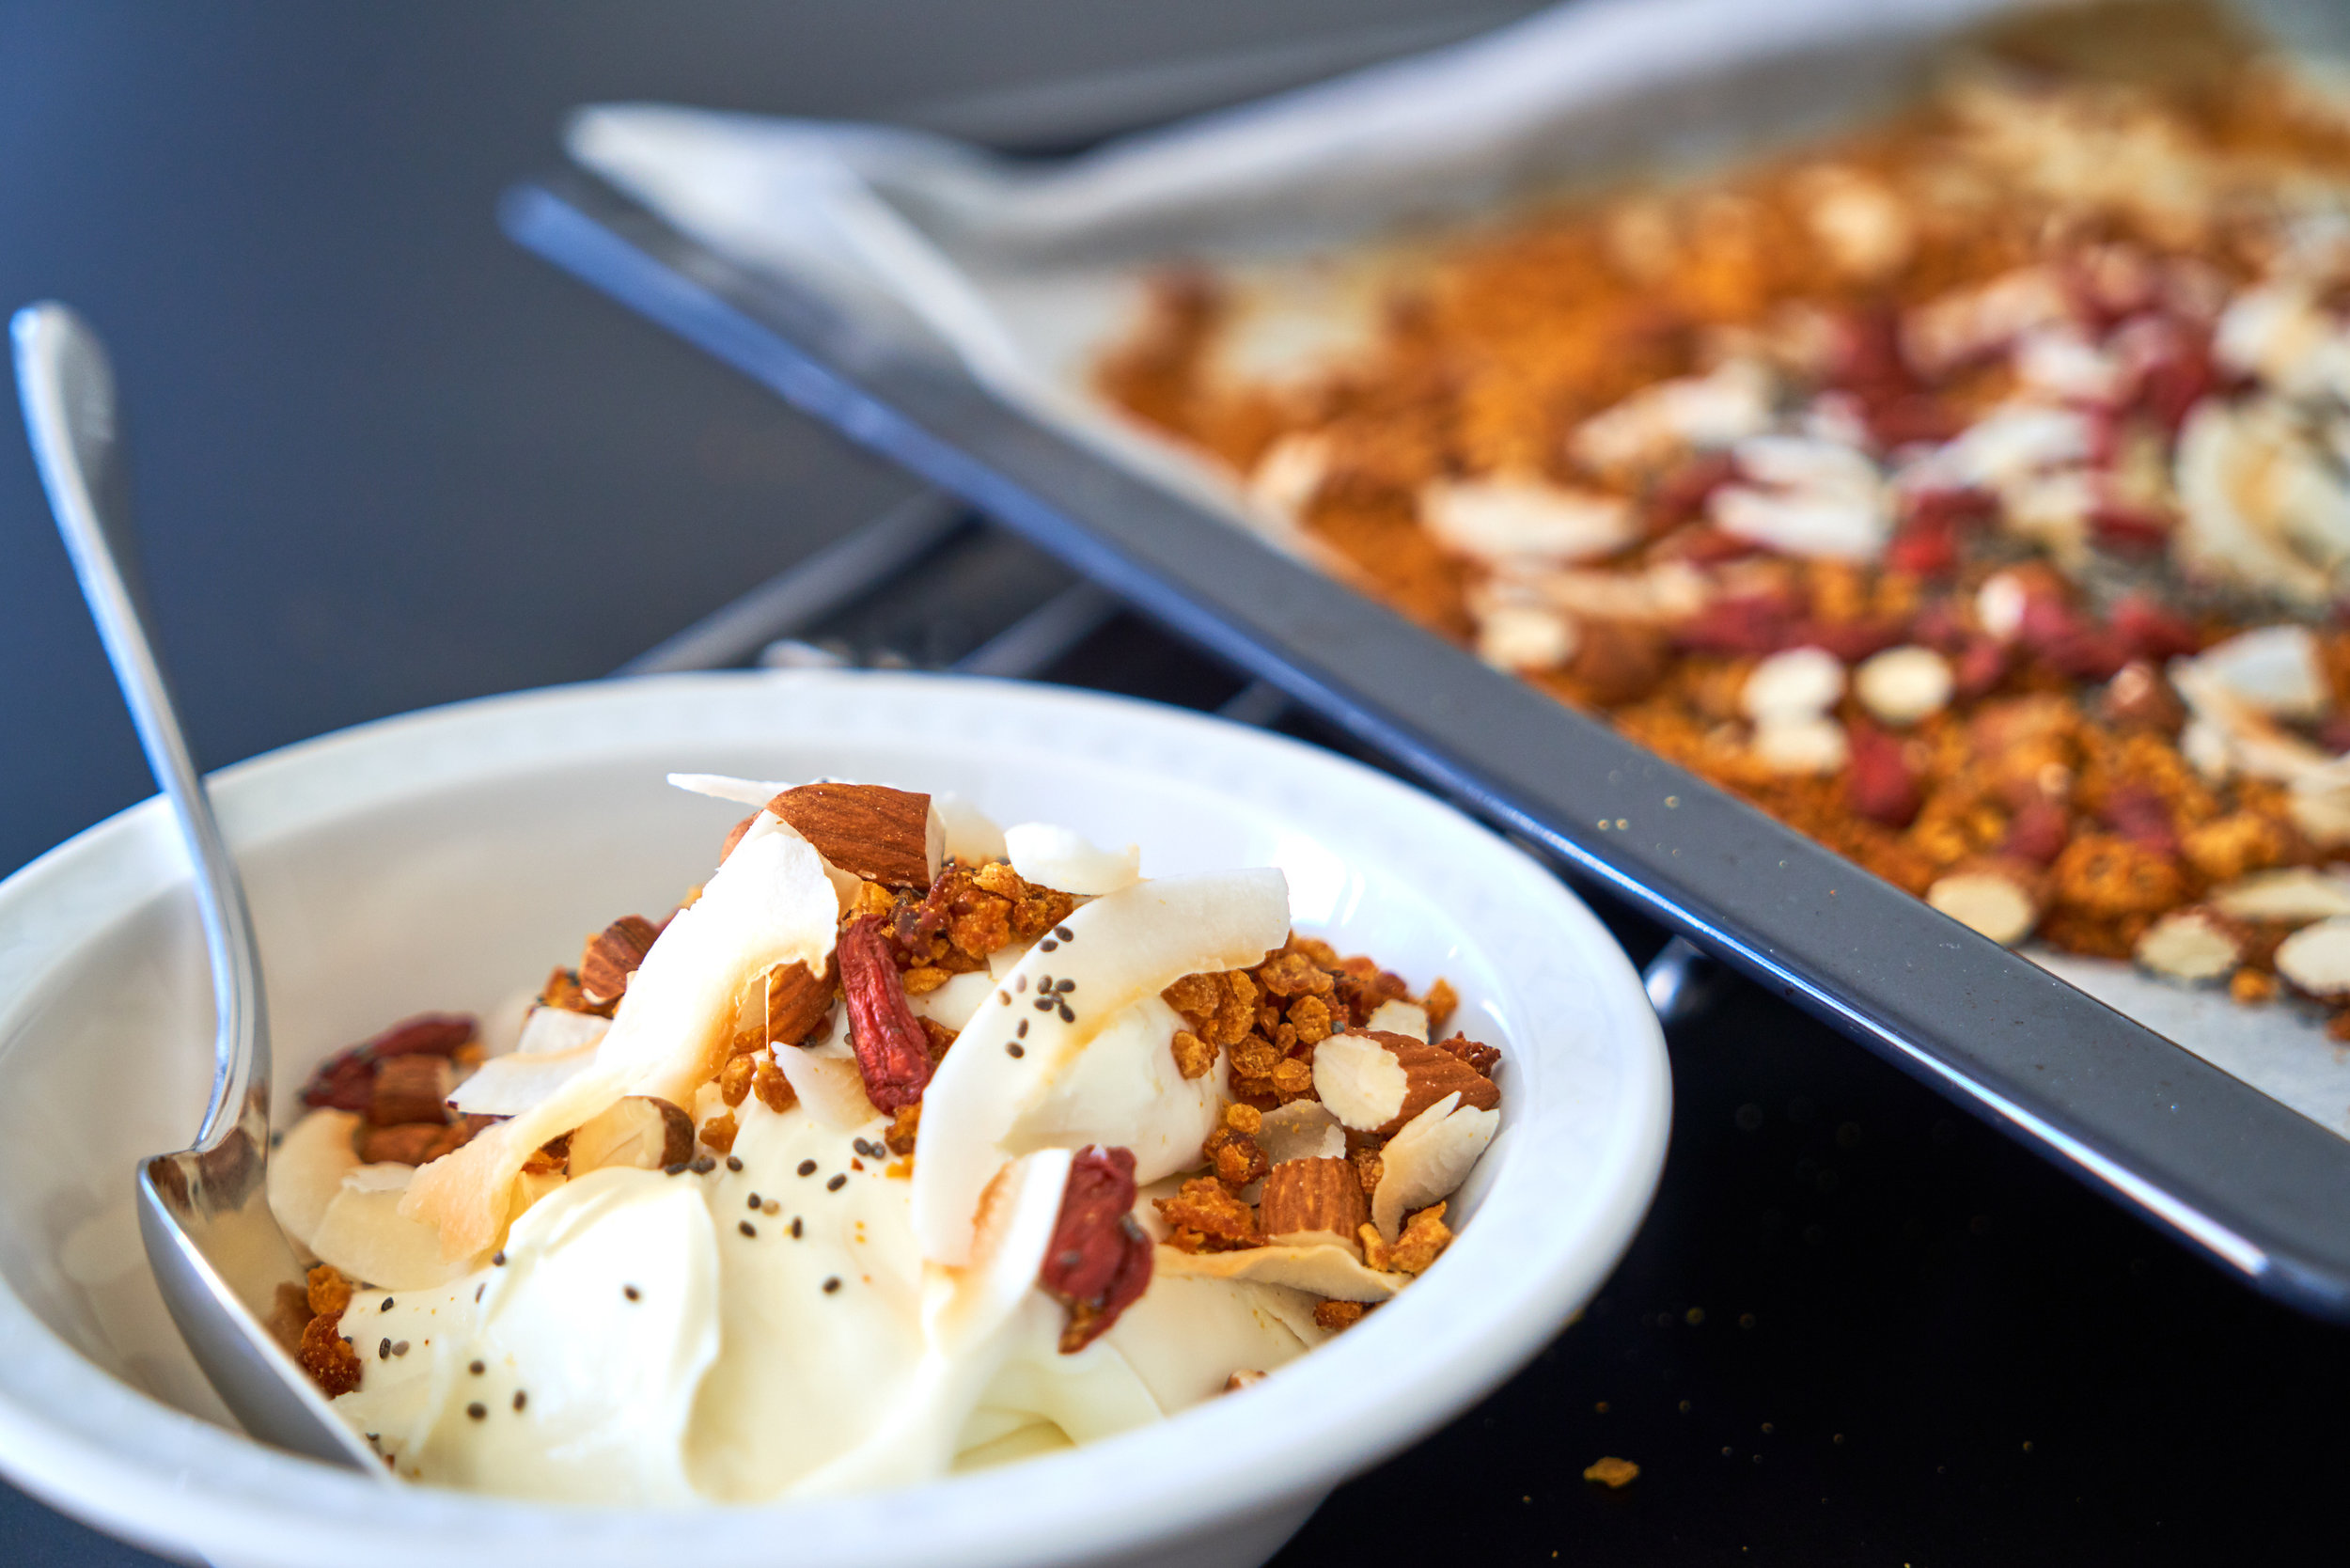 Lentil Granola for a Protein-Rich Breakfast - enjoy with Greek yogurt   In Carina's Kitchen